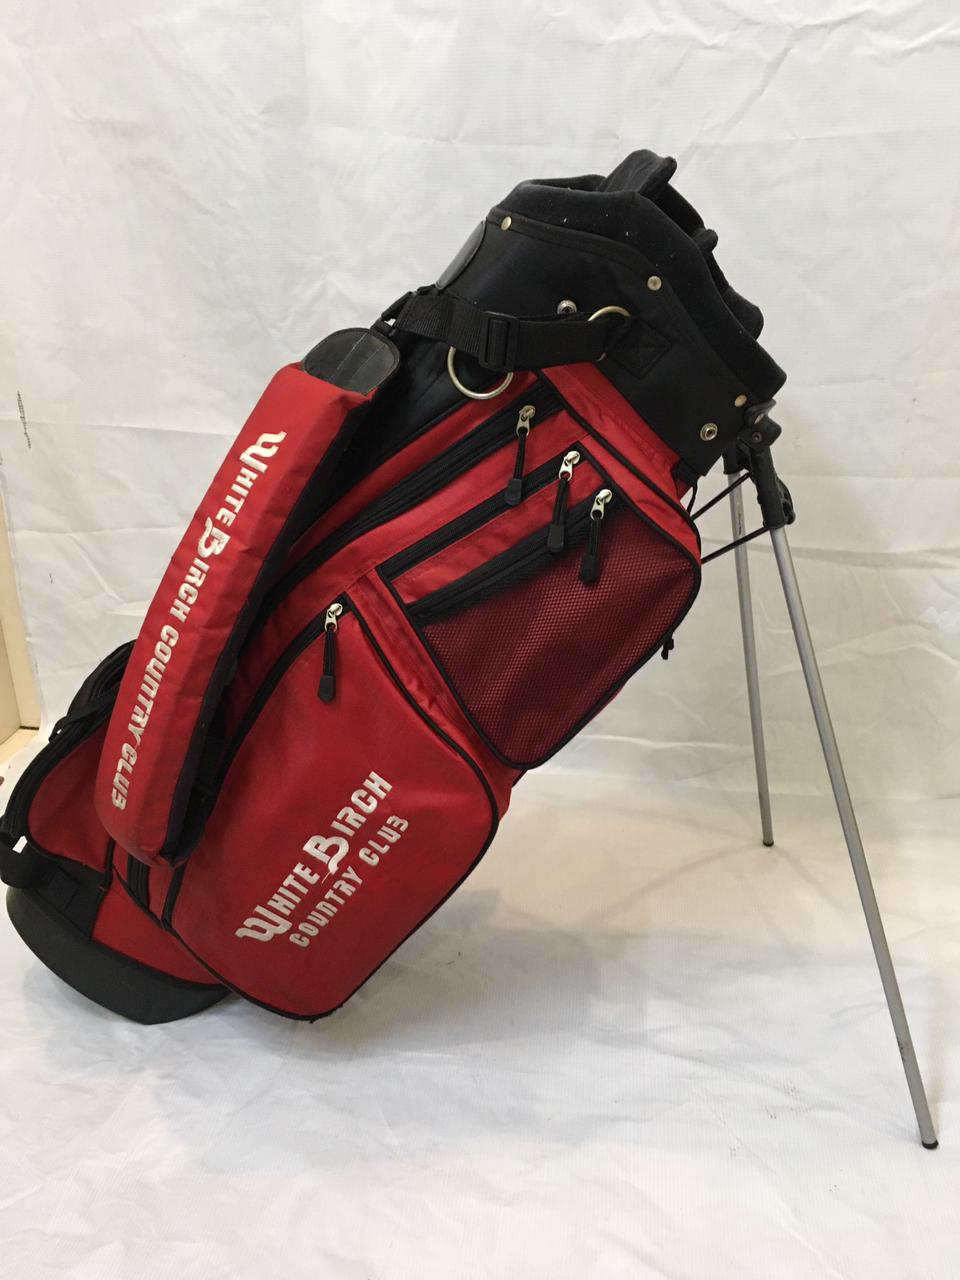 White Birch Country Club Stand Golf Bag